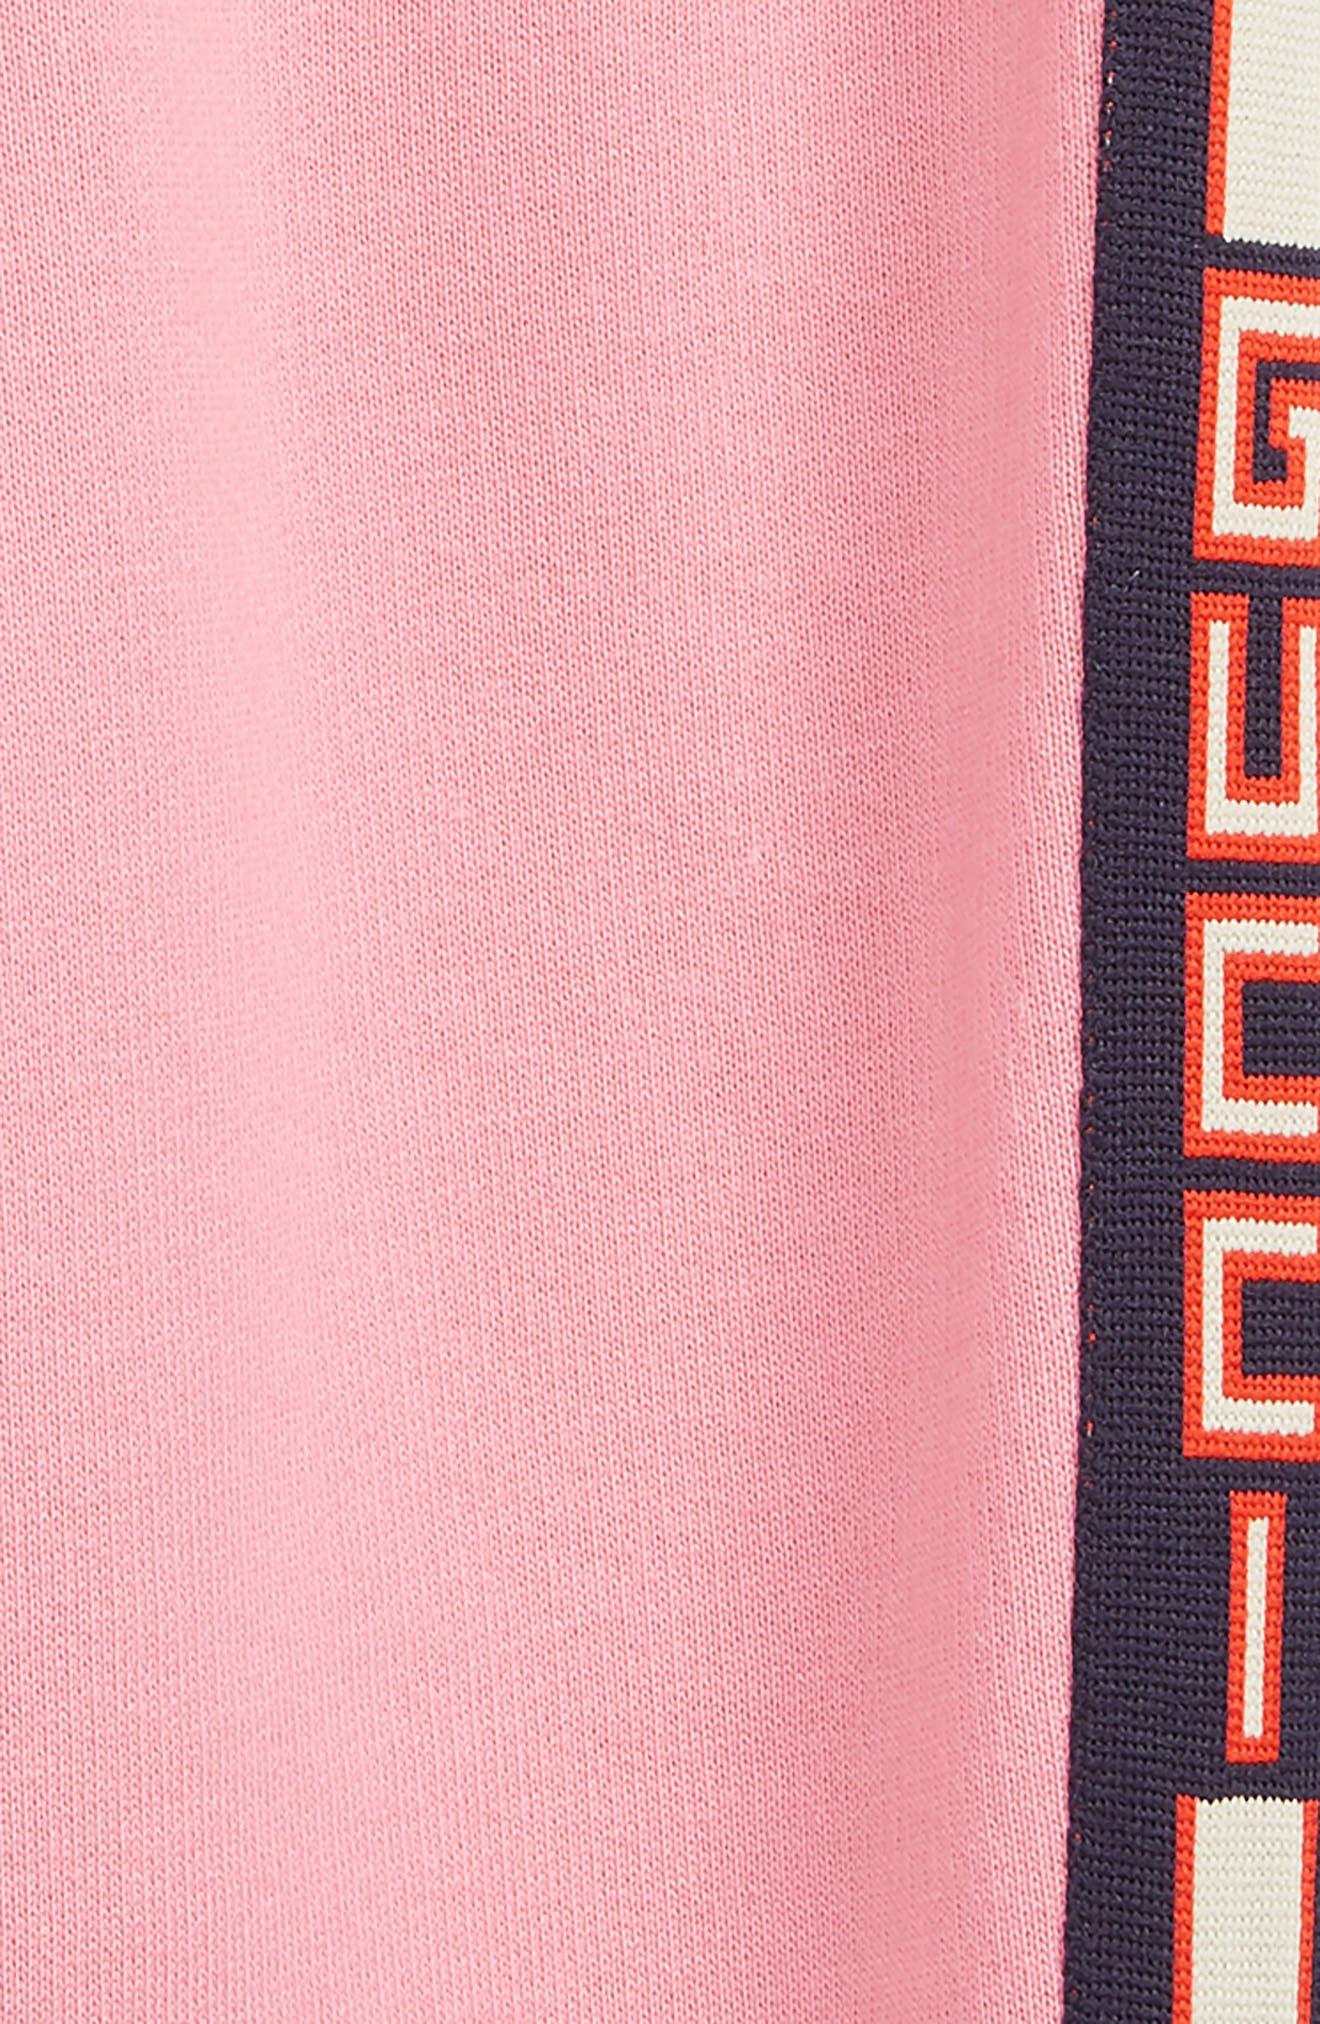 GUCCI,                             Stripe Jogger Sweatpants,                             Alternate thumbnail 2, color,                             PINK LADY/ BLUE/ RED